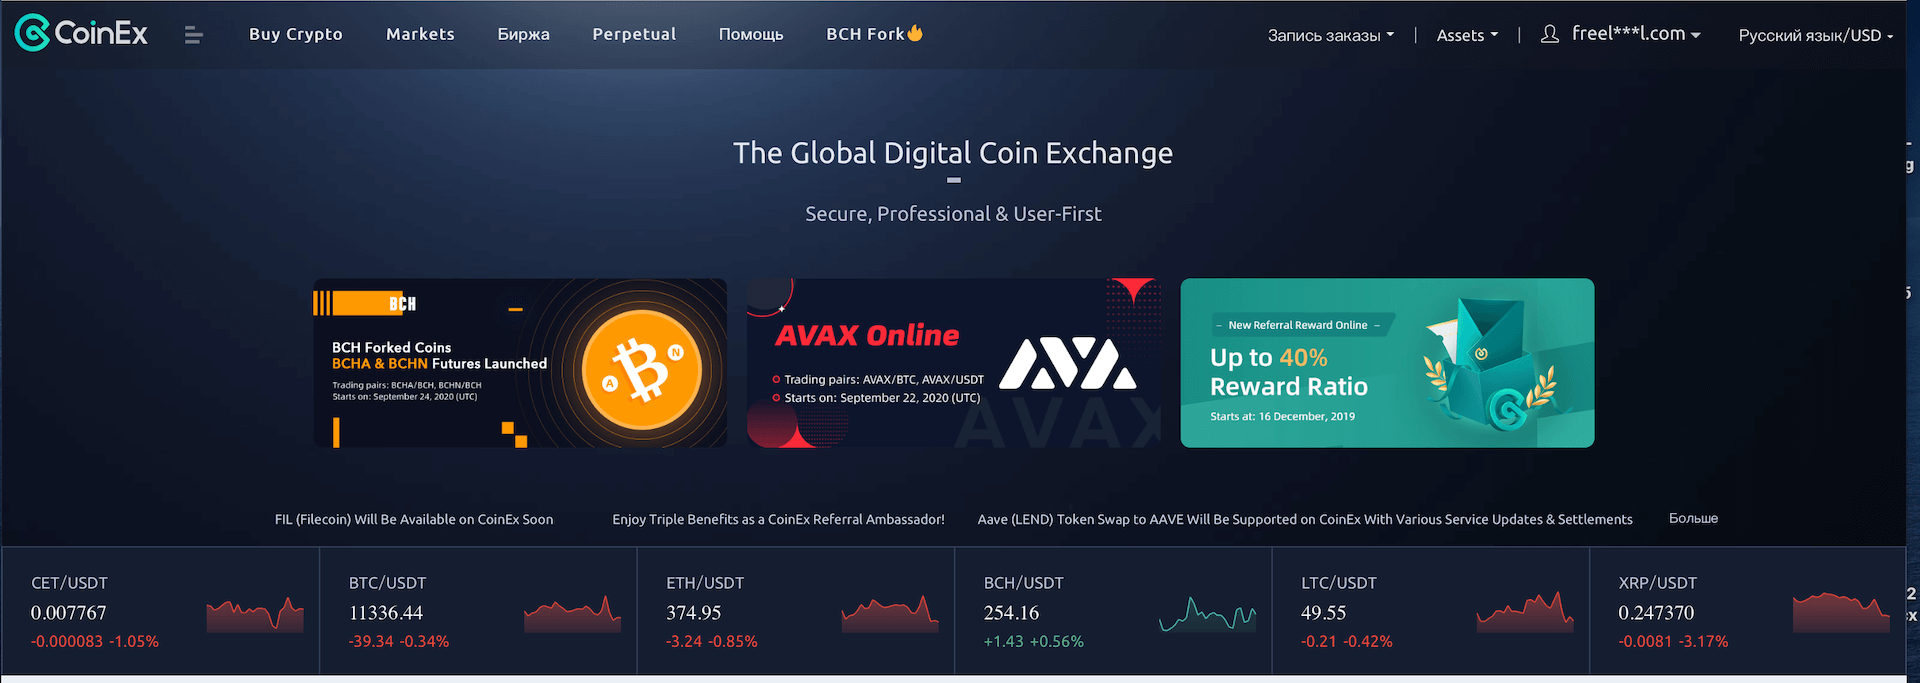 биржа криптовалют CoinEx